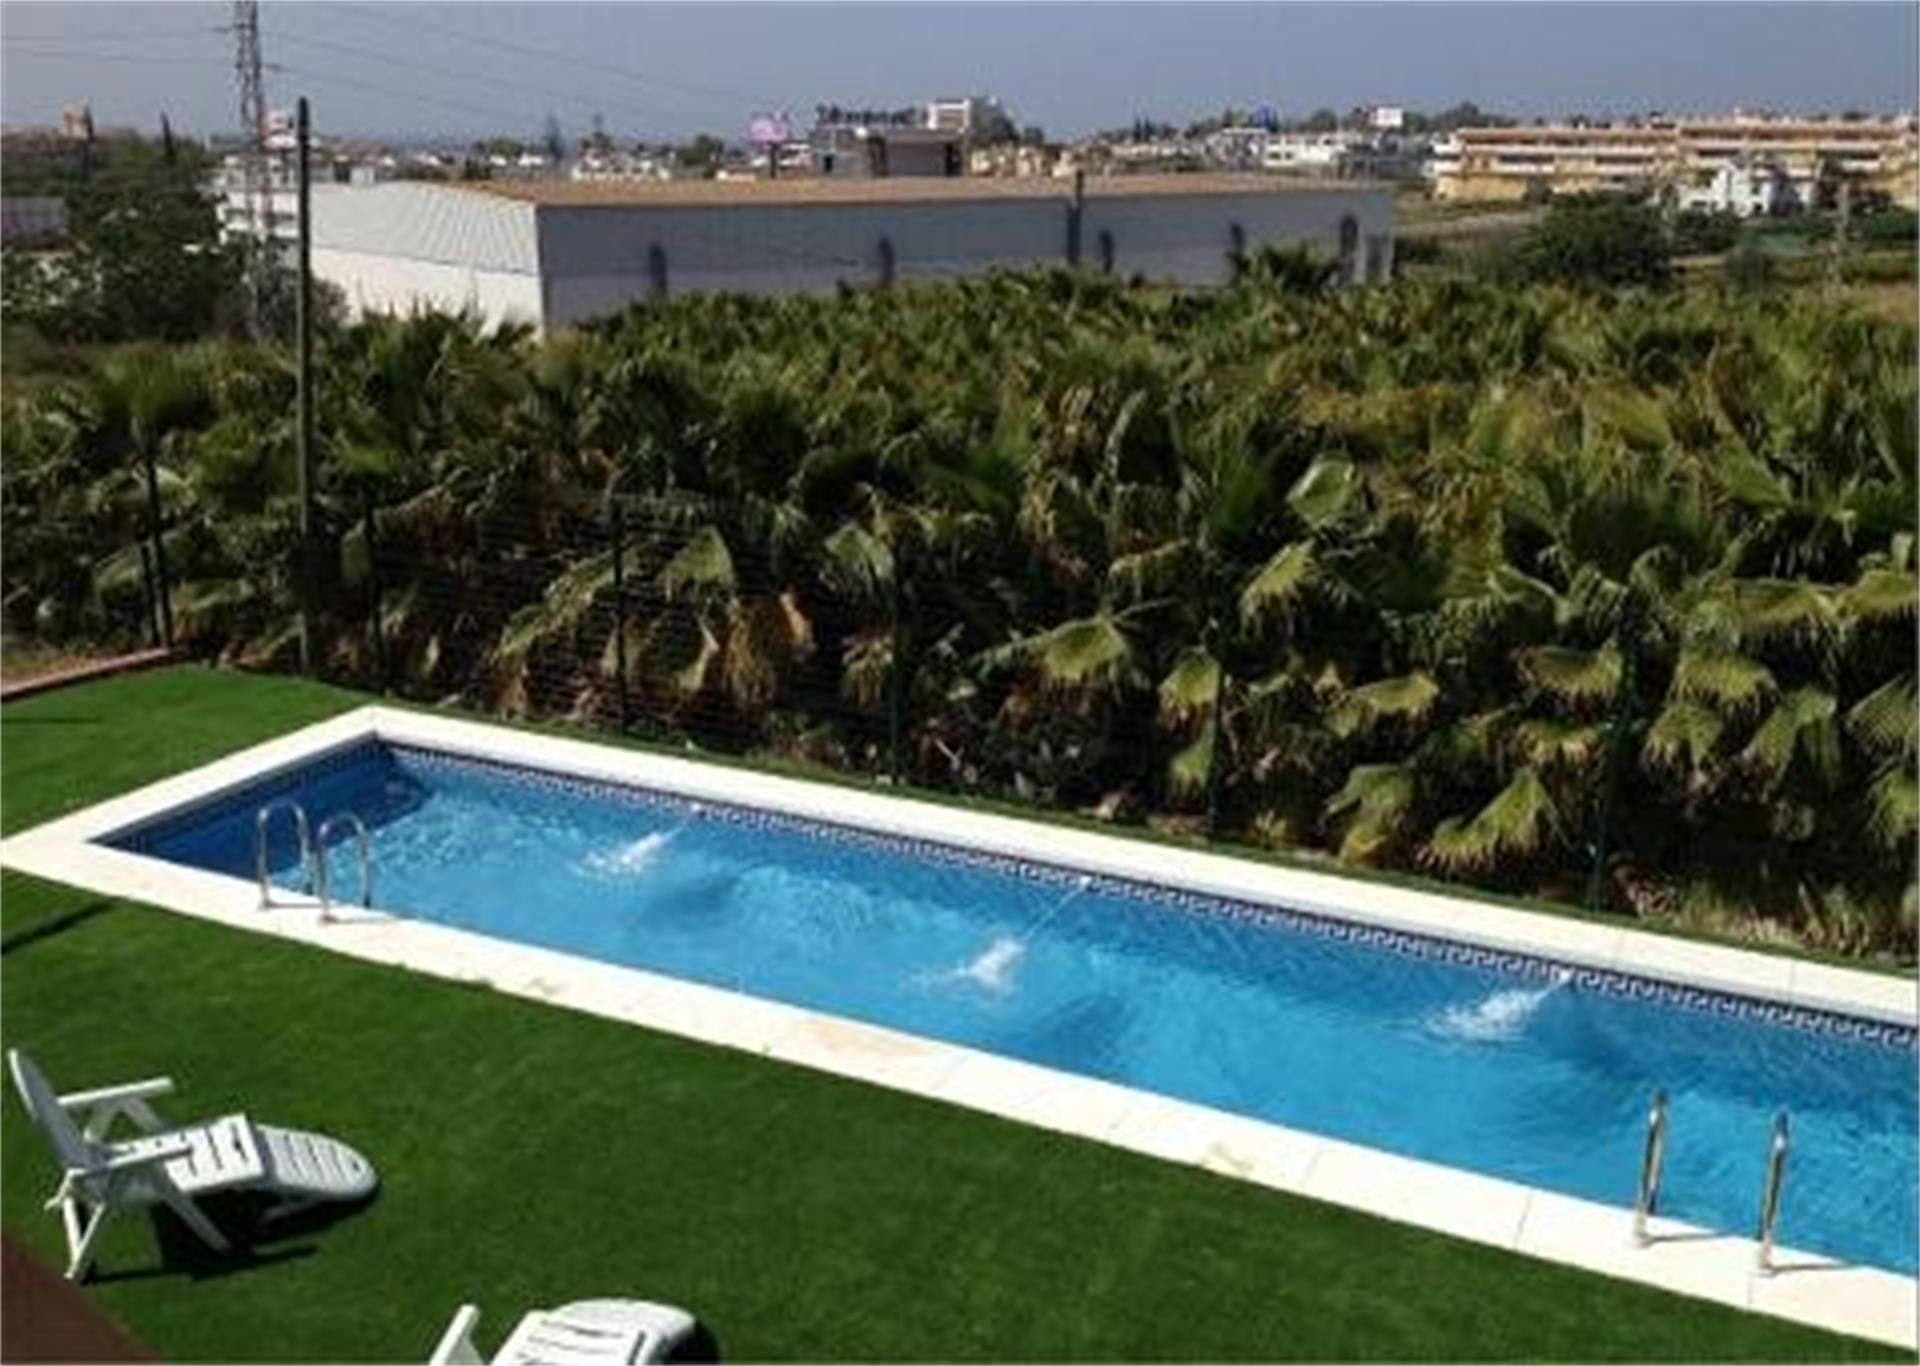 Casa o chalet en Bel Air - Cancelada - Saladillo (Bel-Air, Málaga)